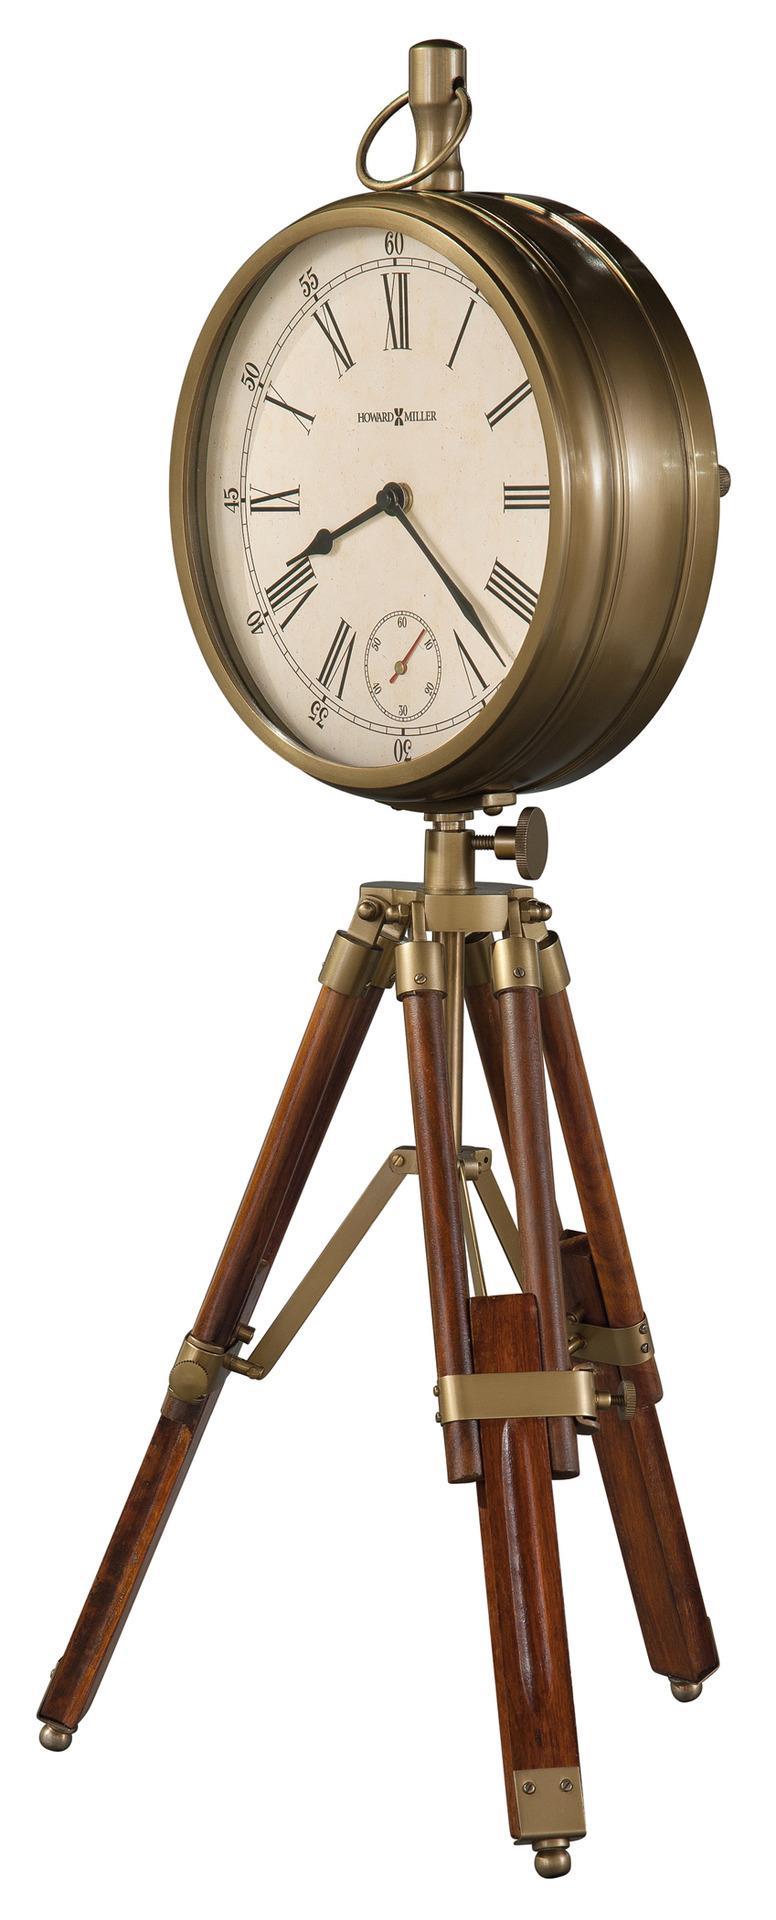 Howard Miller 635-192 Time Surveyor Mantel  - фото 2